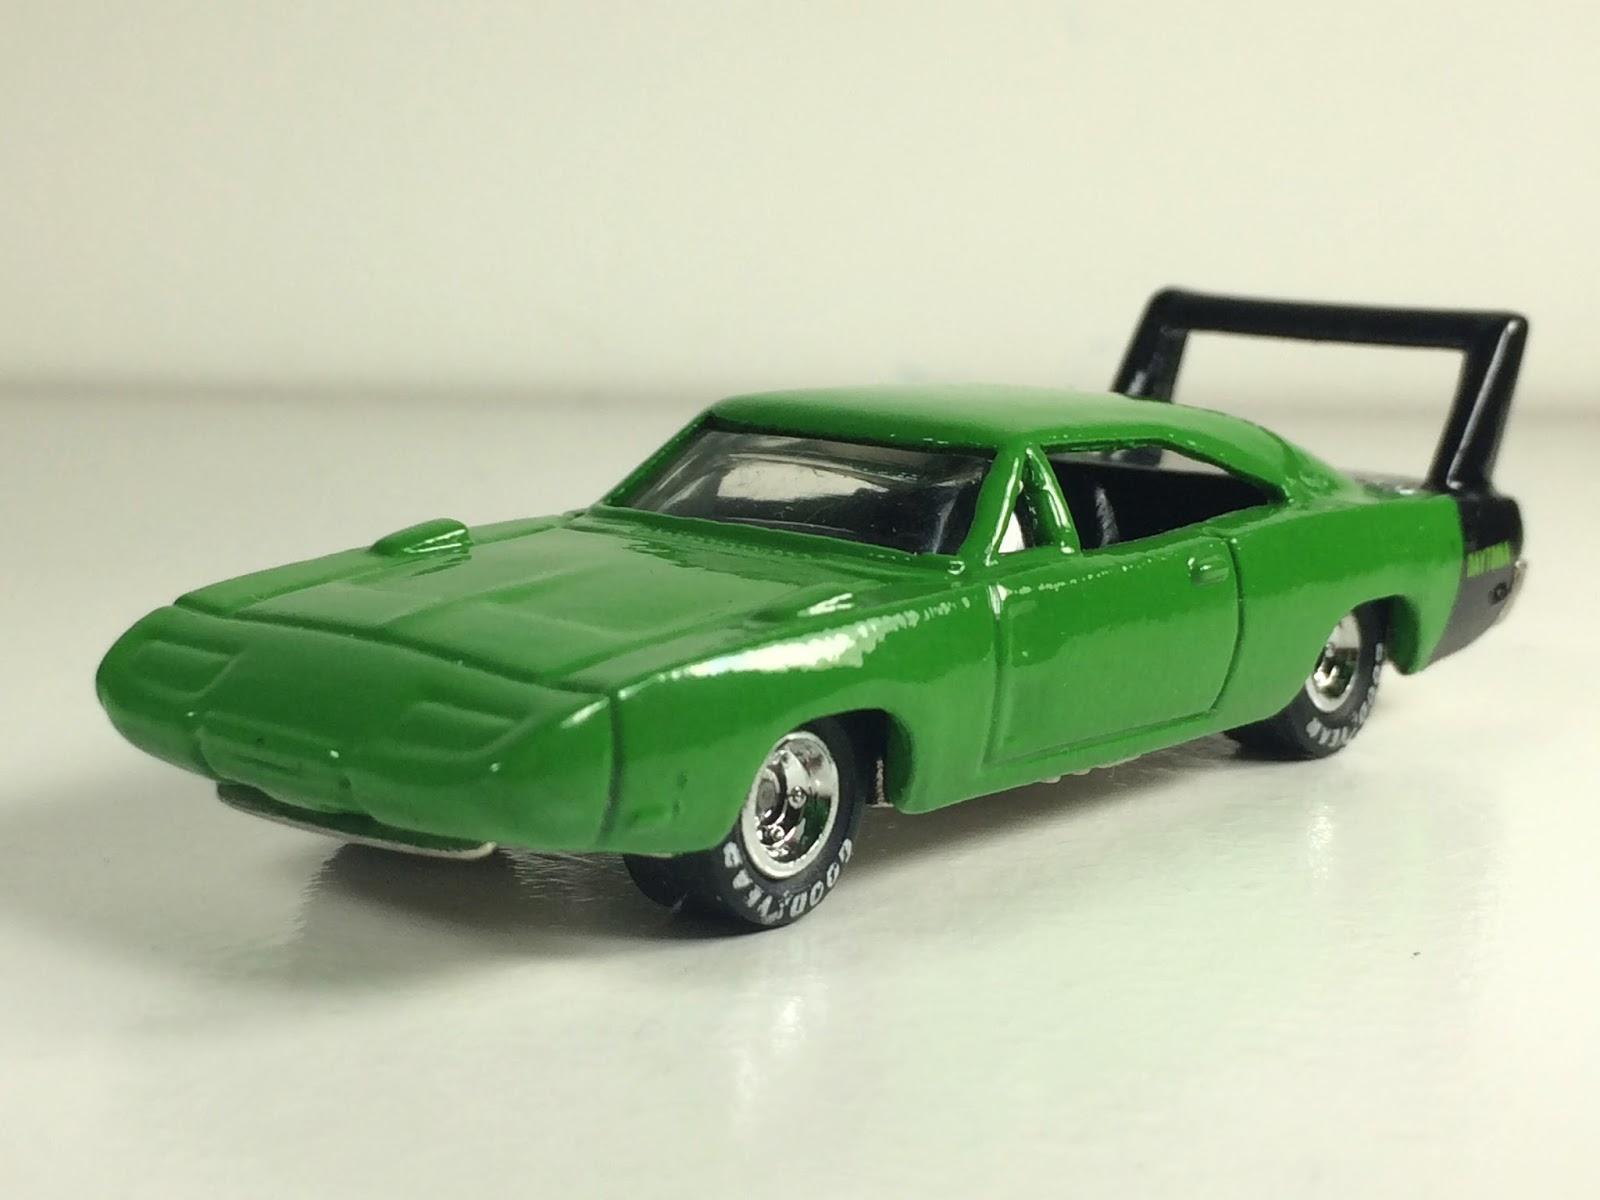 60's Muscle Car Set